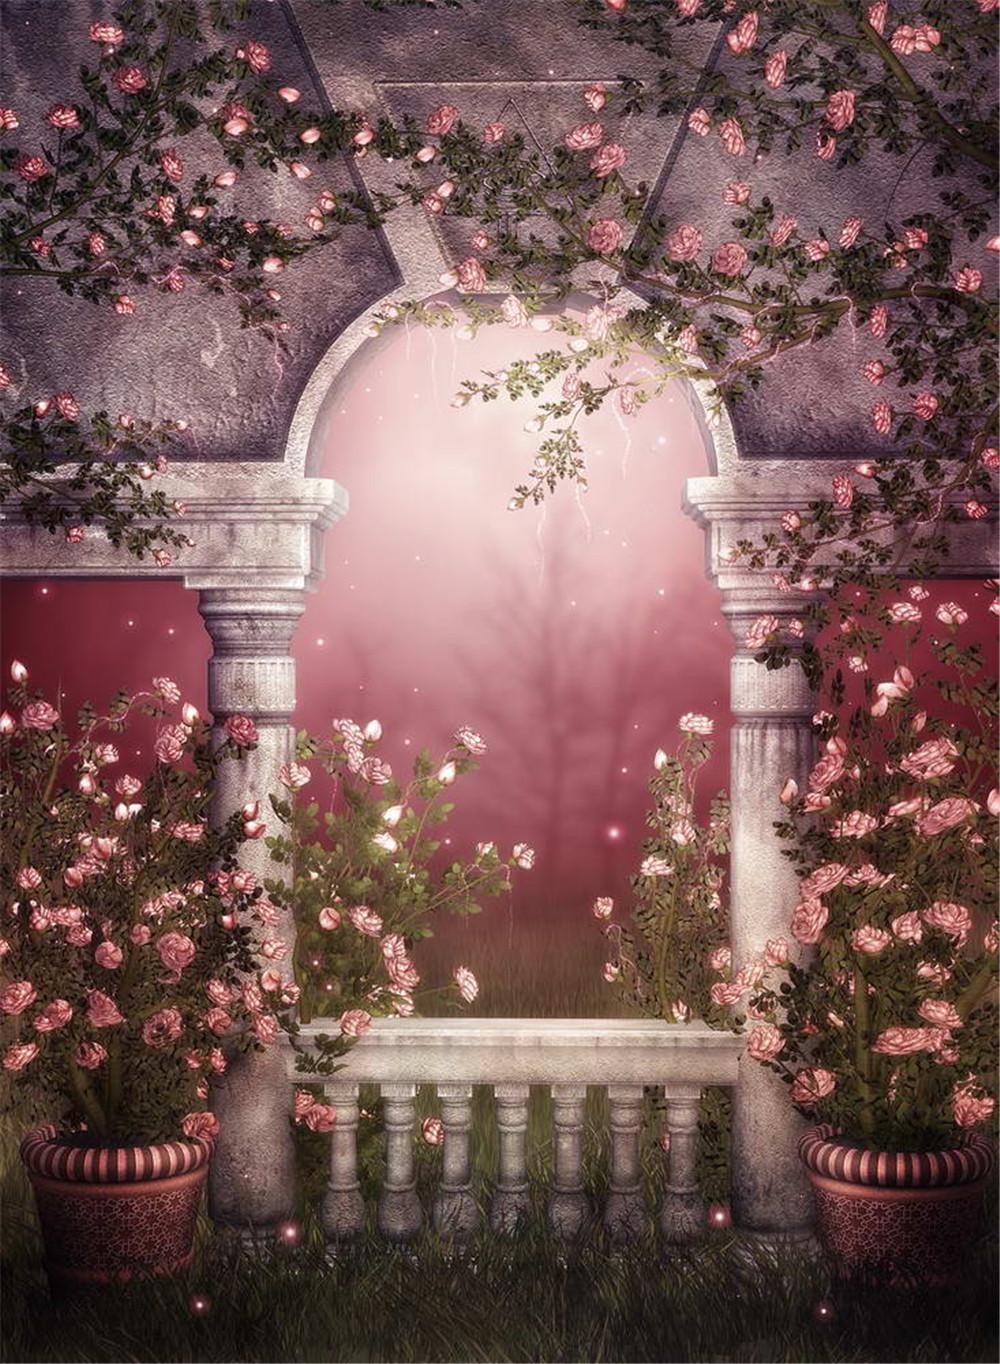 Fantasy vinyl backdrops for photography garden moonlight balcony pink flowers vines romantic wedding photo shoot background vintage background photography